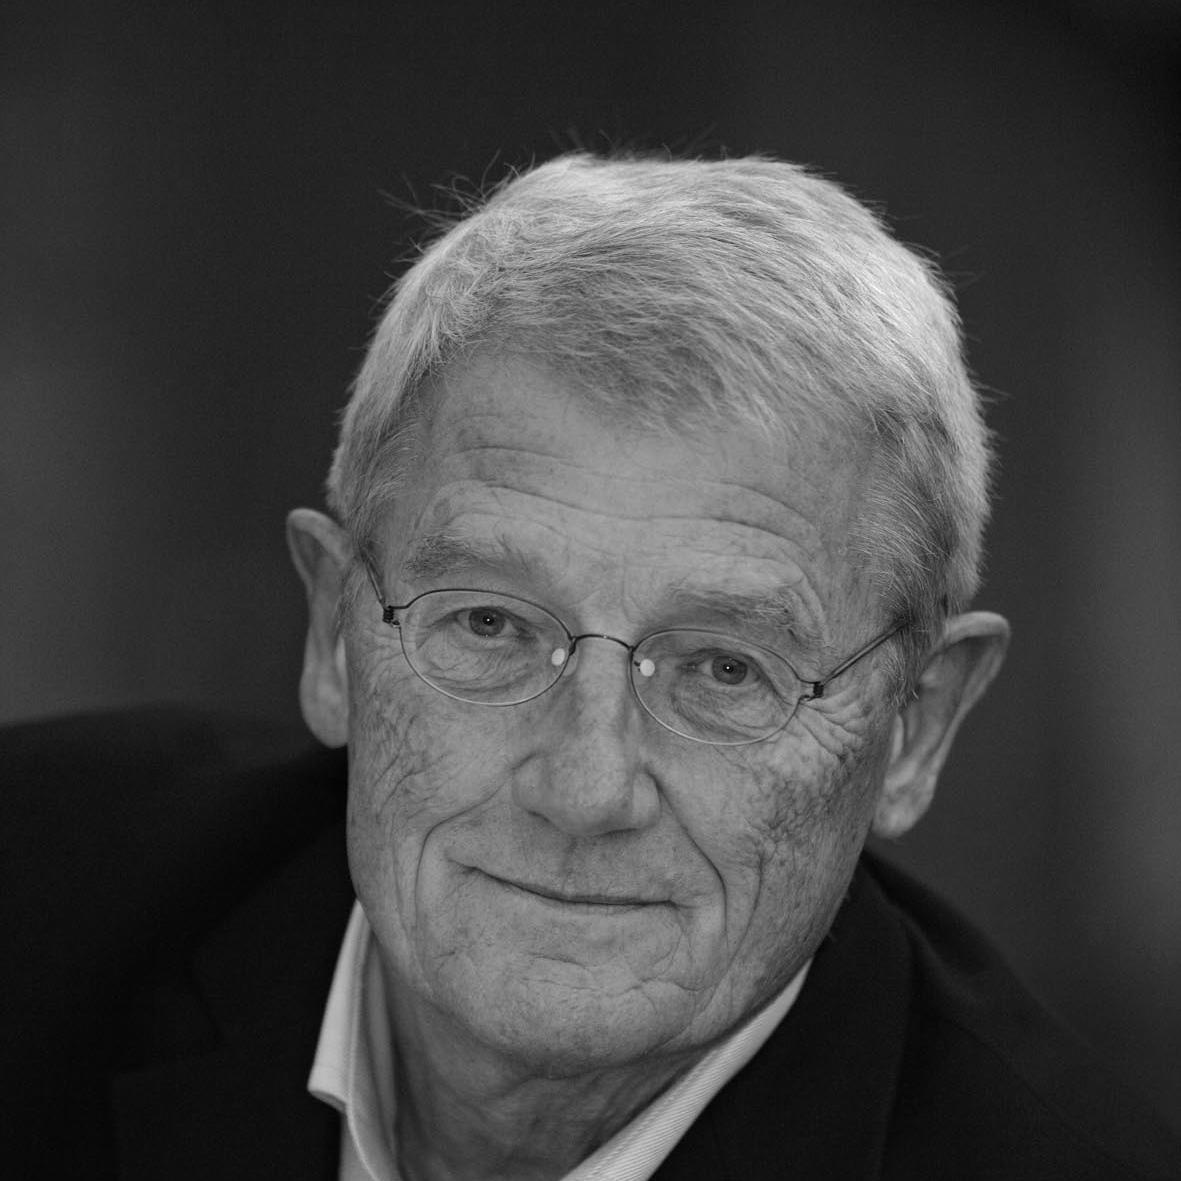 Dr. Gerd B. Achenbach   Philosophische Praxis Gerd B. Achenbach  Bergisch Gladbach